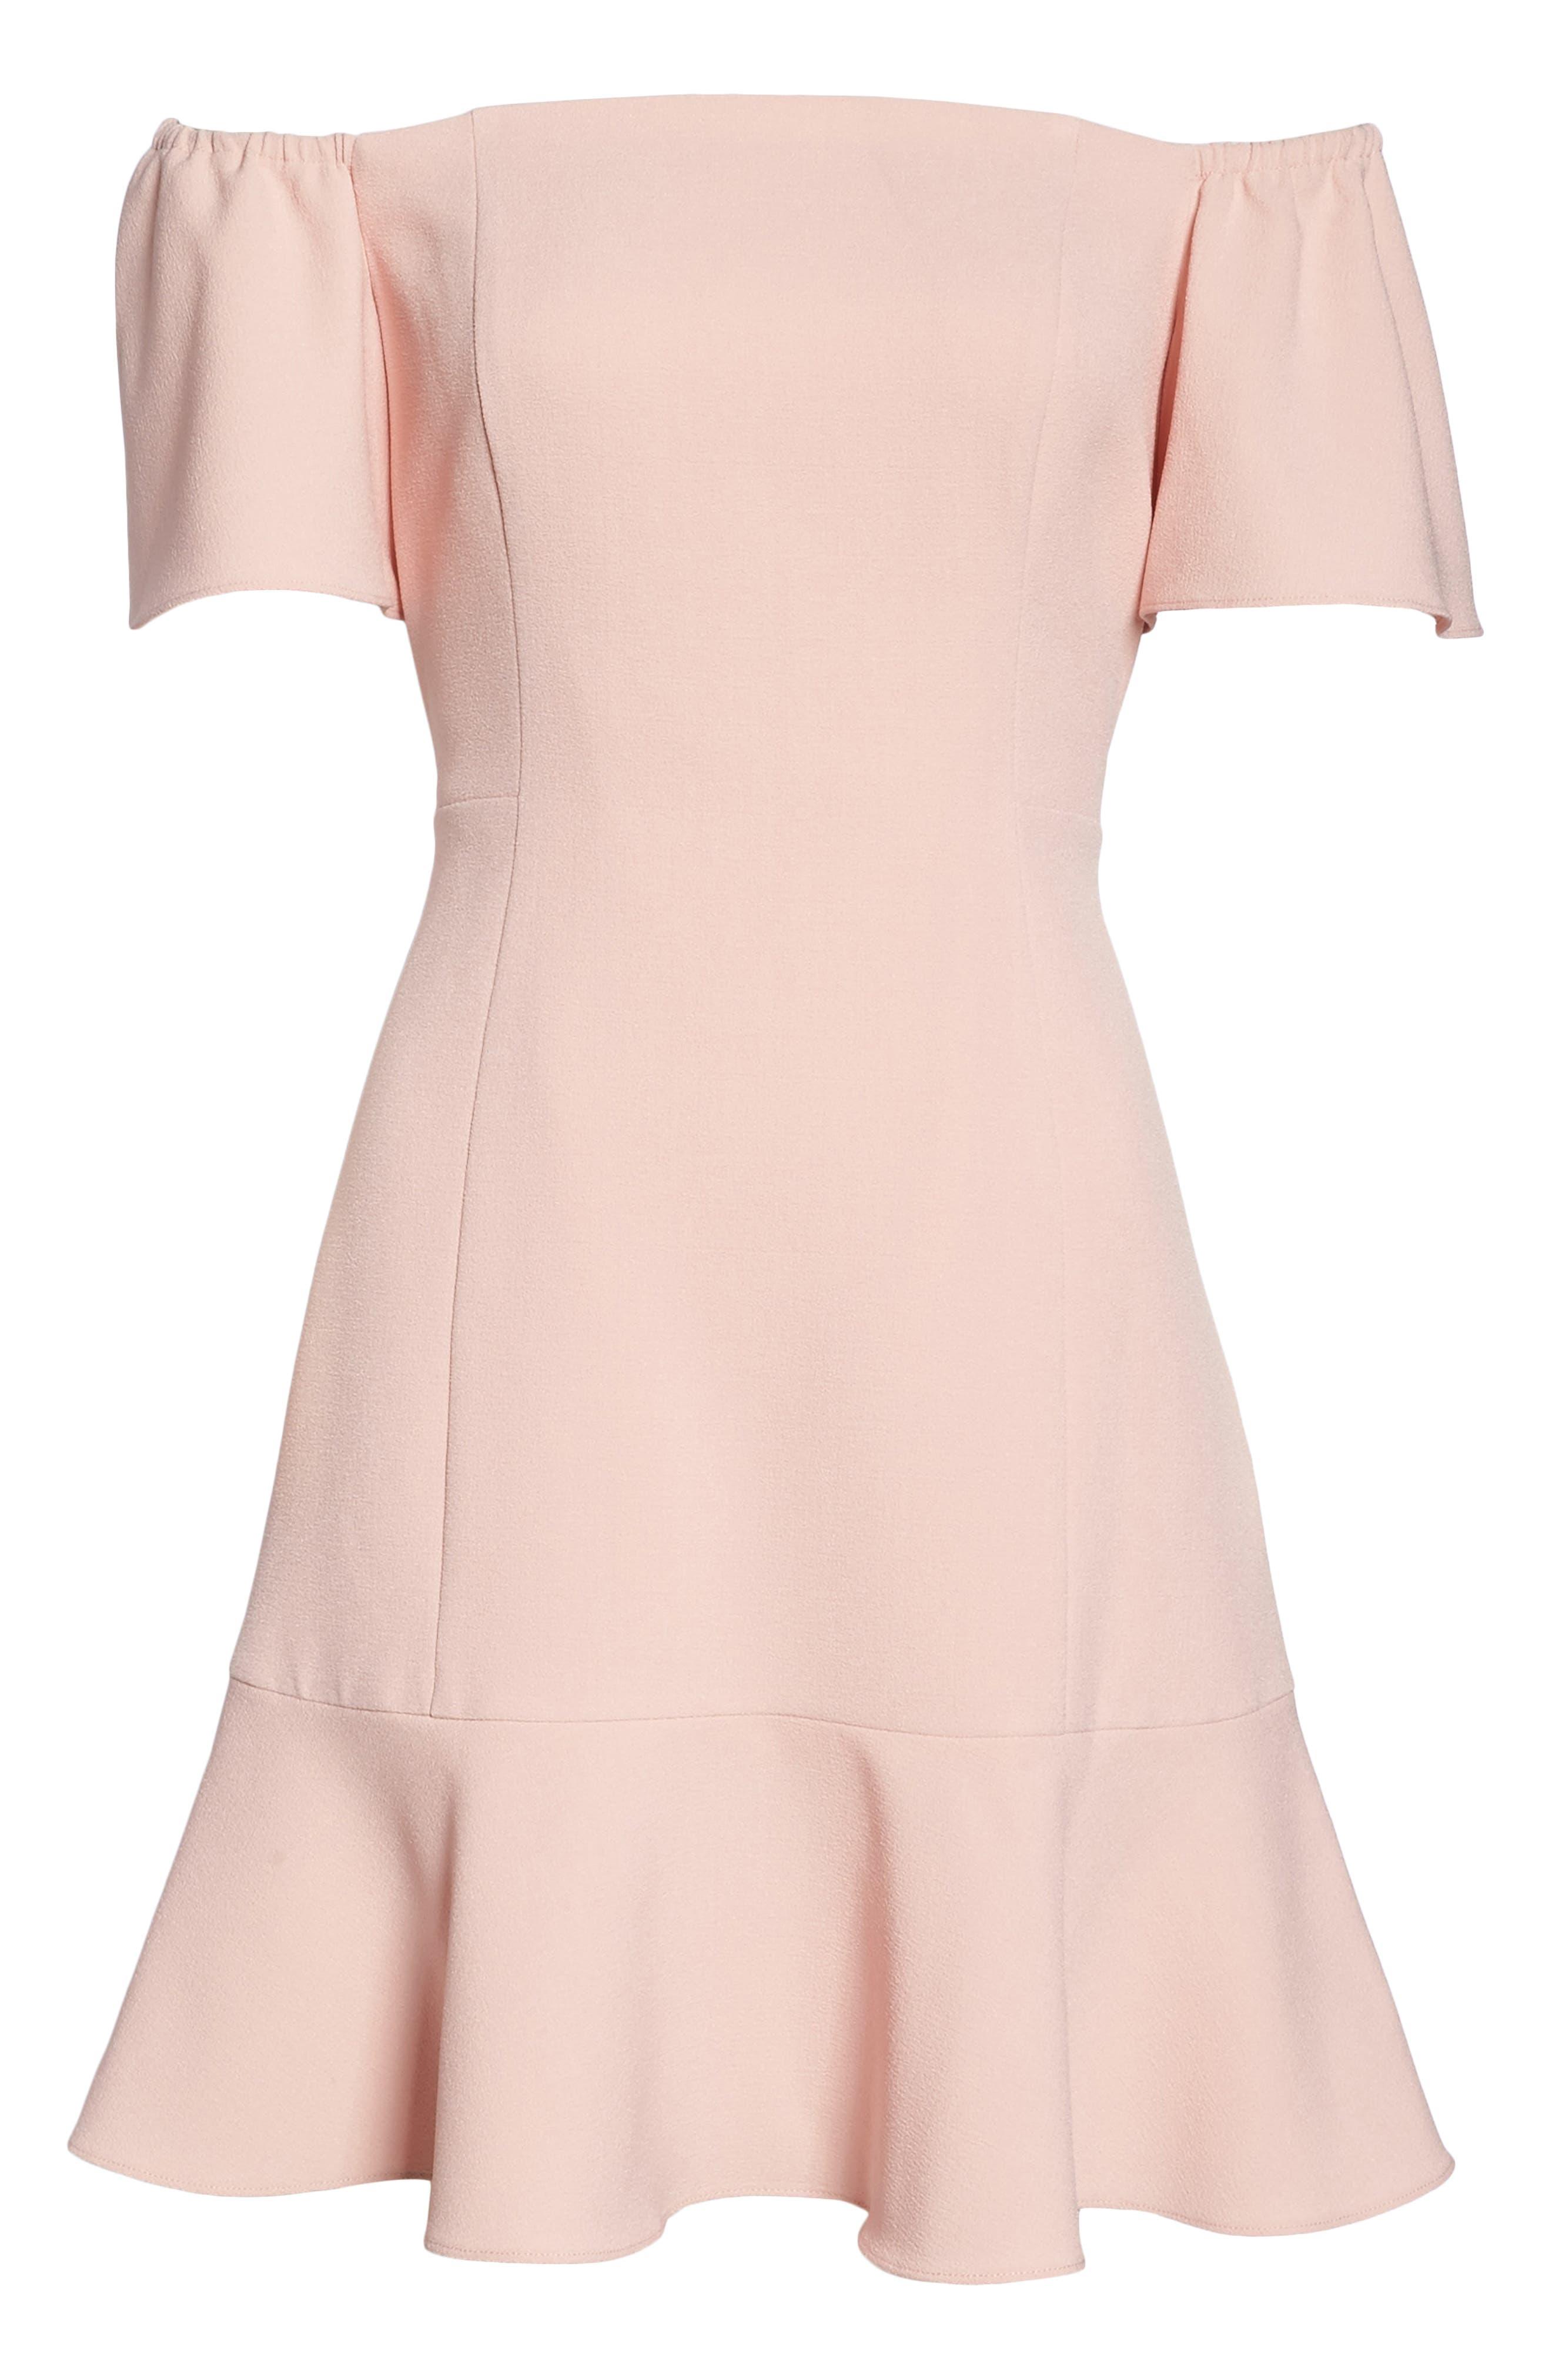 Off the Shoulder Dress,                             Alternate thumbnail 6, color,                             Blush